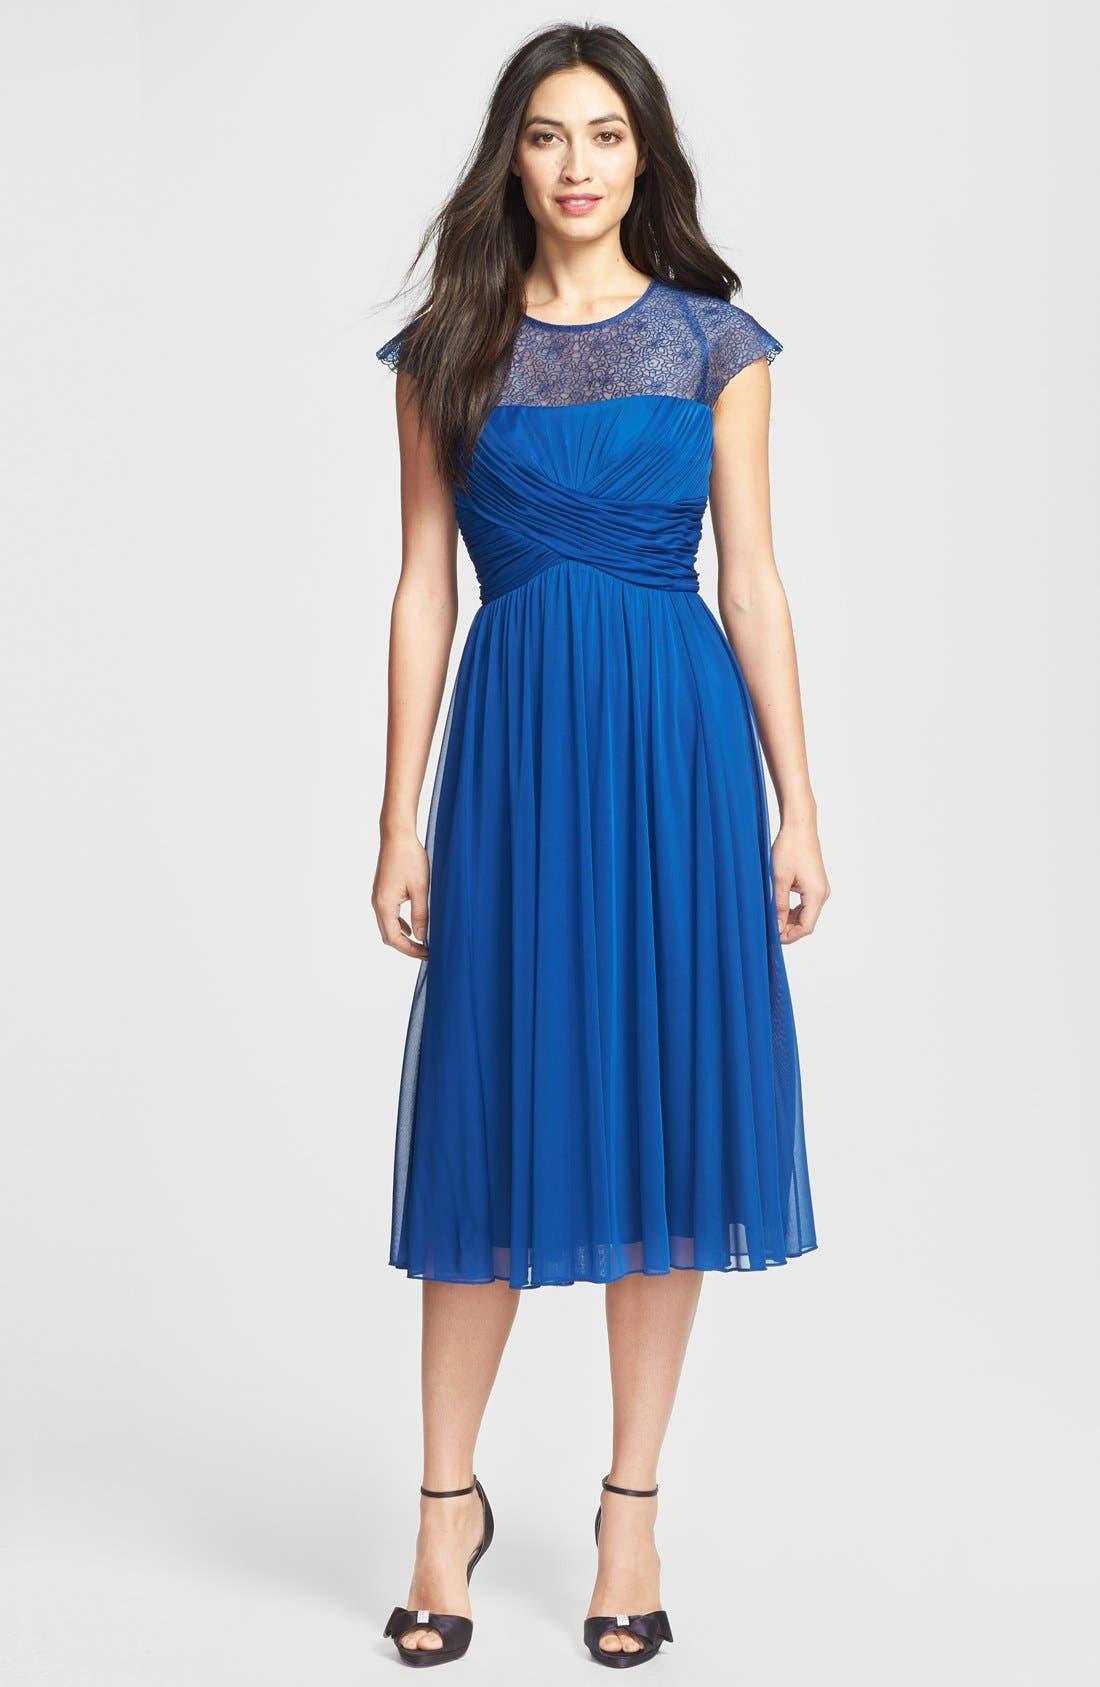 Main Image - Alex Evenings Ruched Cap Sleeve Tea Length Dress